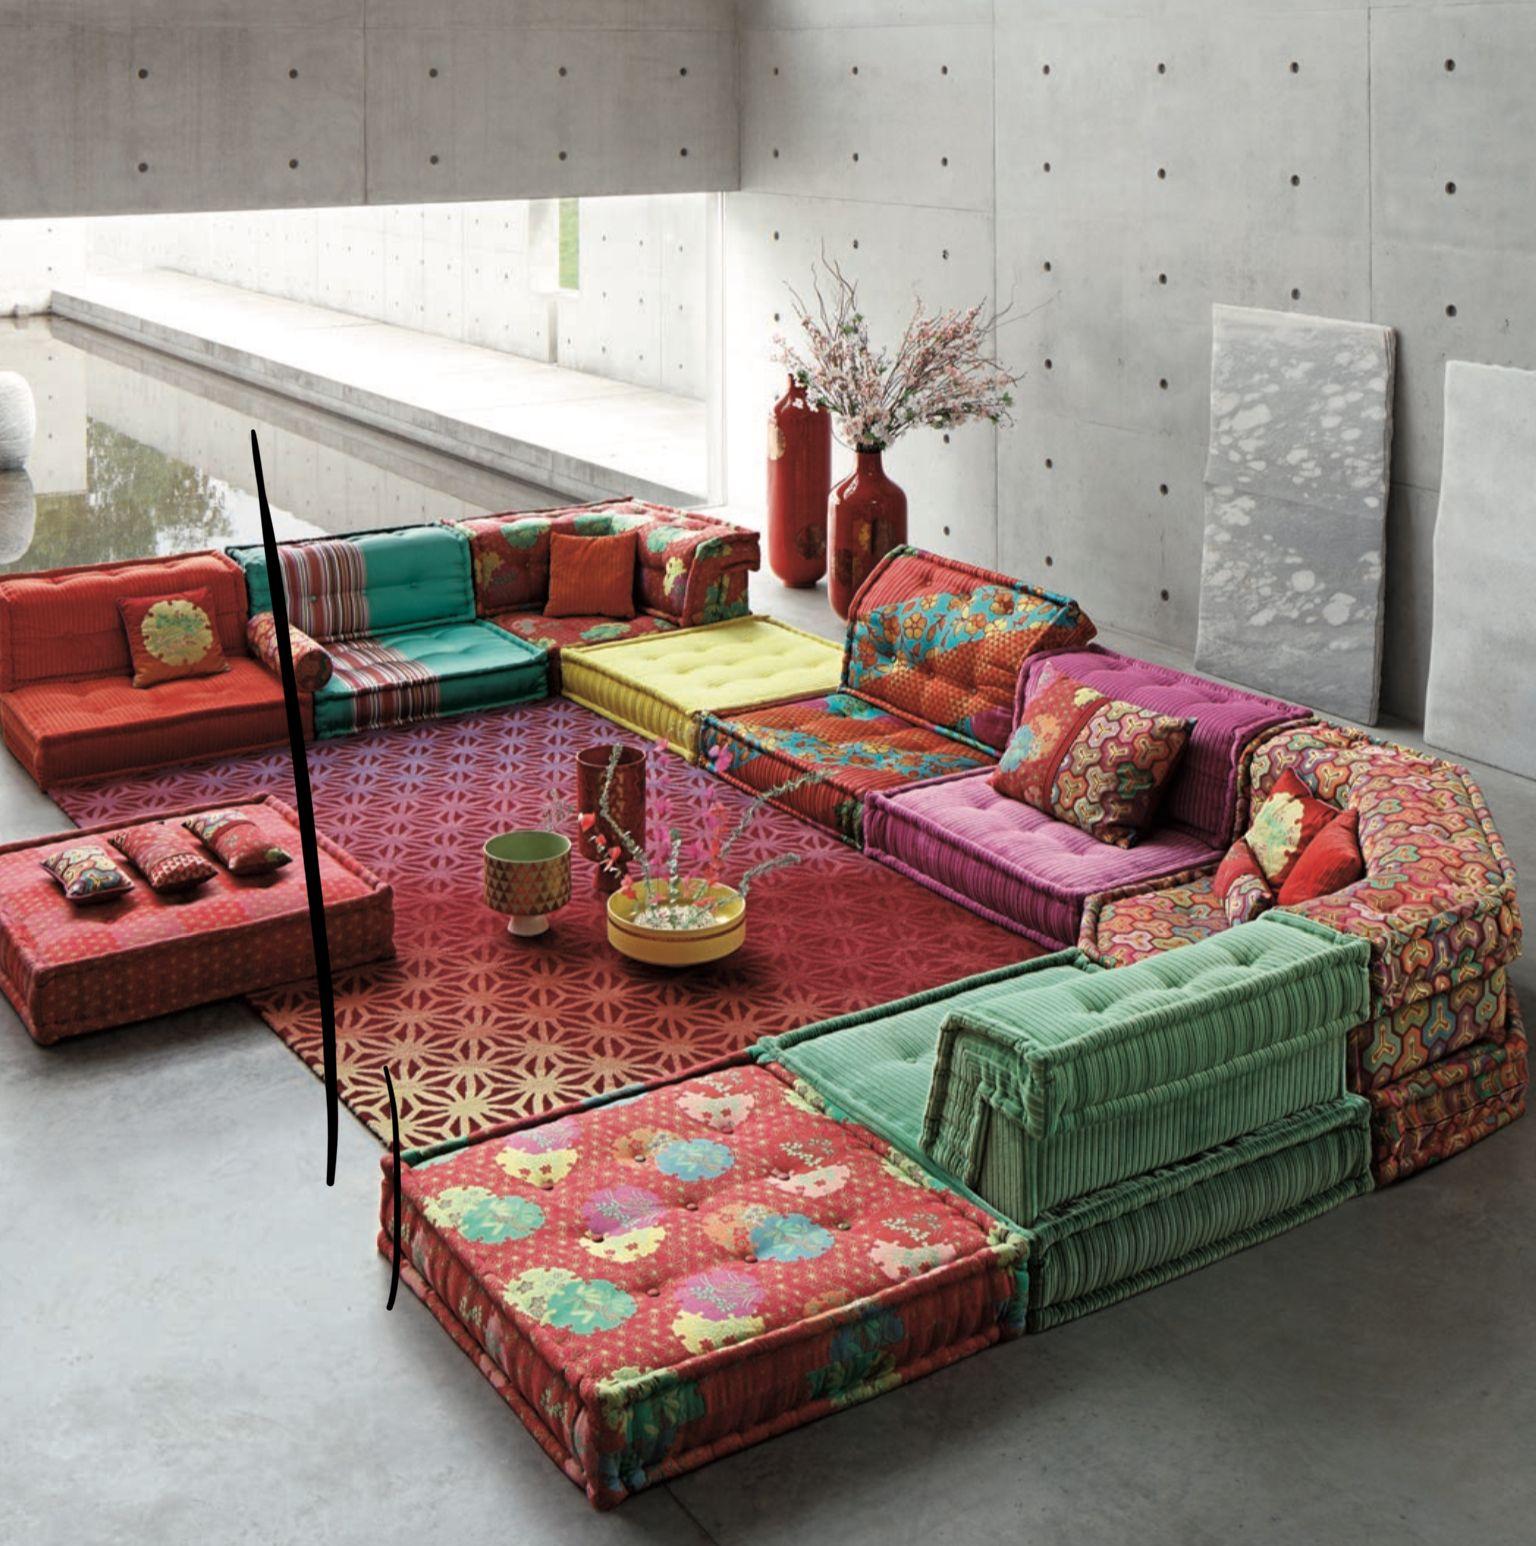 Kenzo Takada Roche Bobois Floor Seating Living Room Floor Seating Living Room Seating